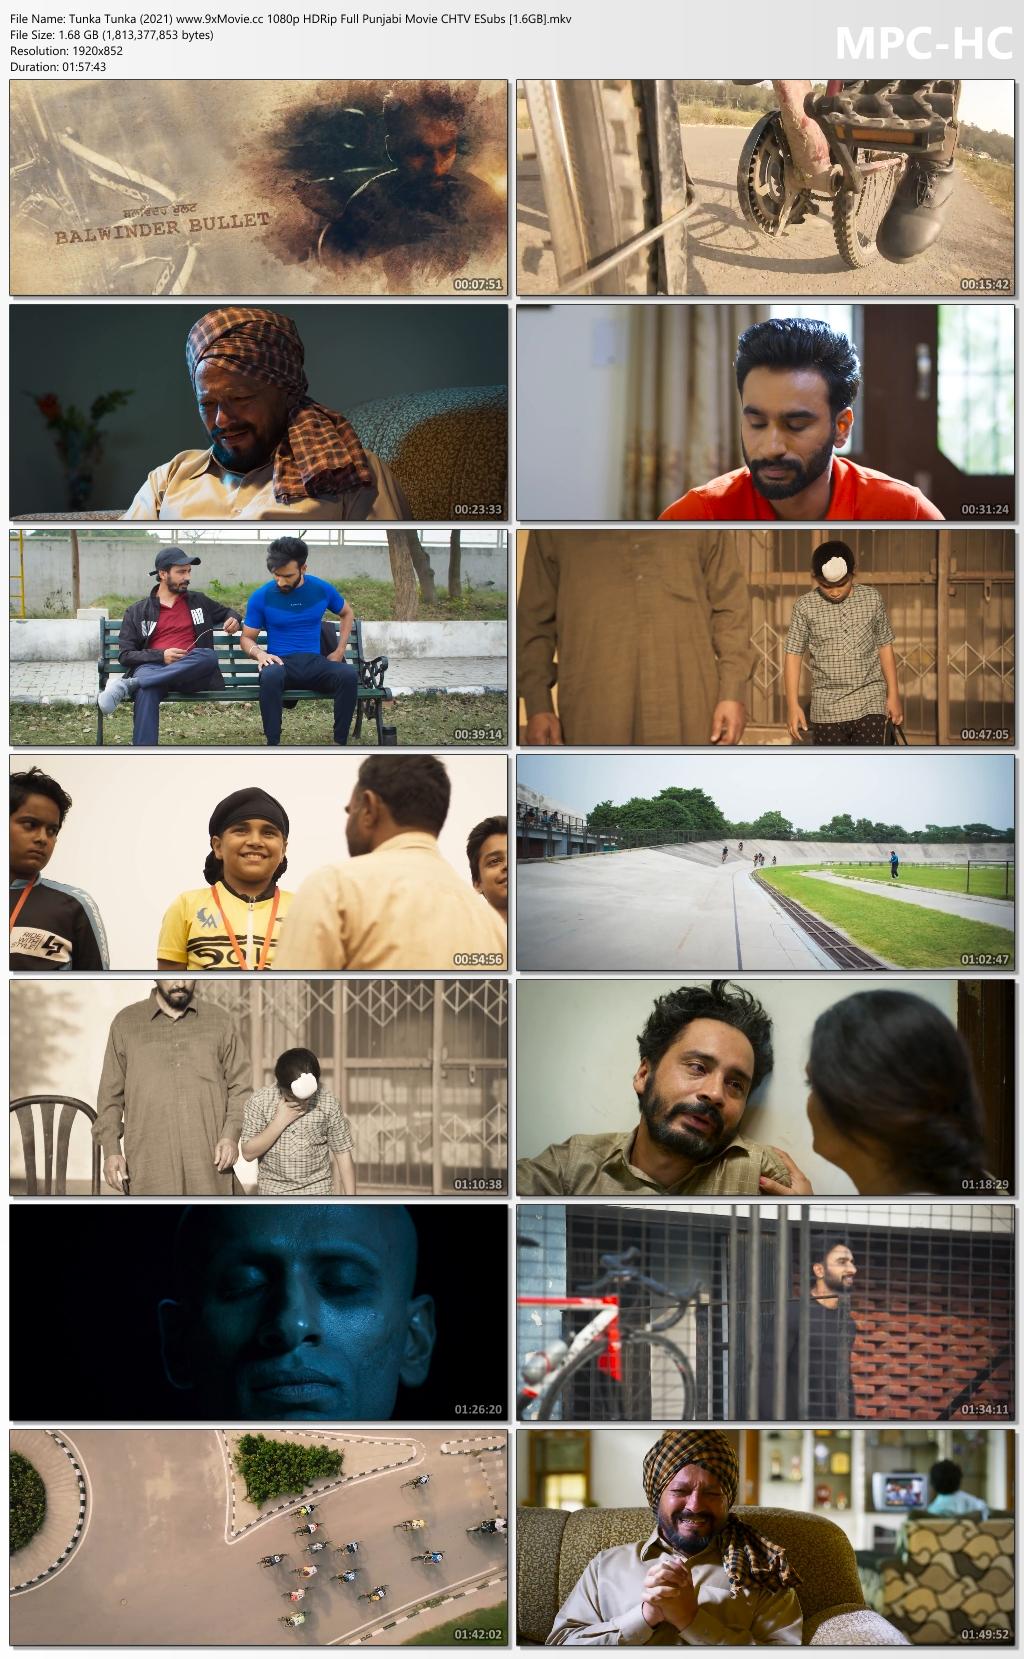 Tunka-Tunka-2021-www-9x-Movie-cc-1080p-HDRip-Full-Punjabi-Movie-CHTV-ESubs-1-6-GB-mkv